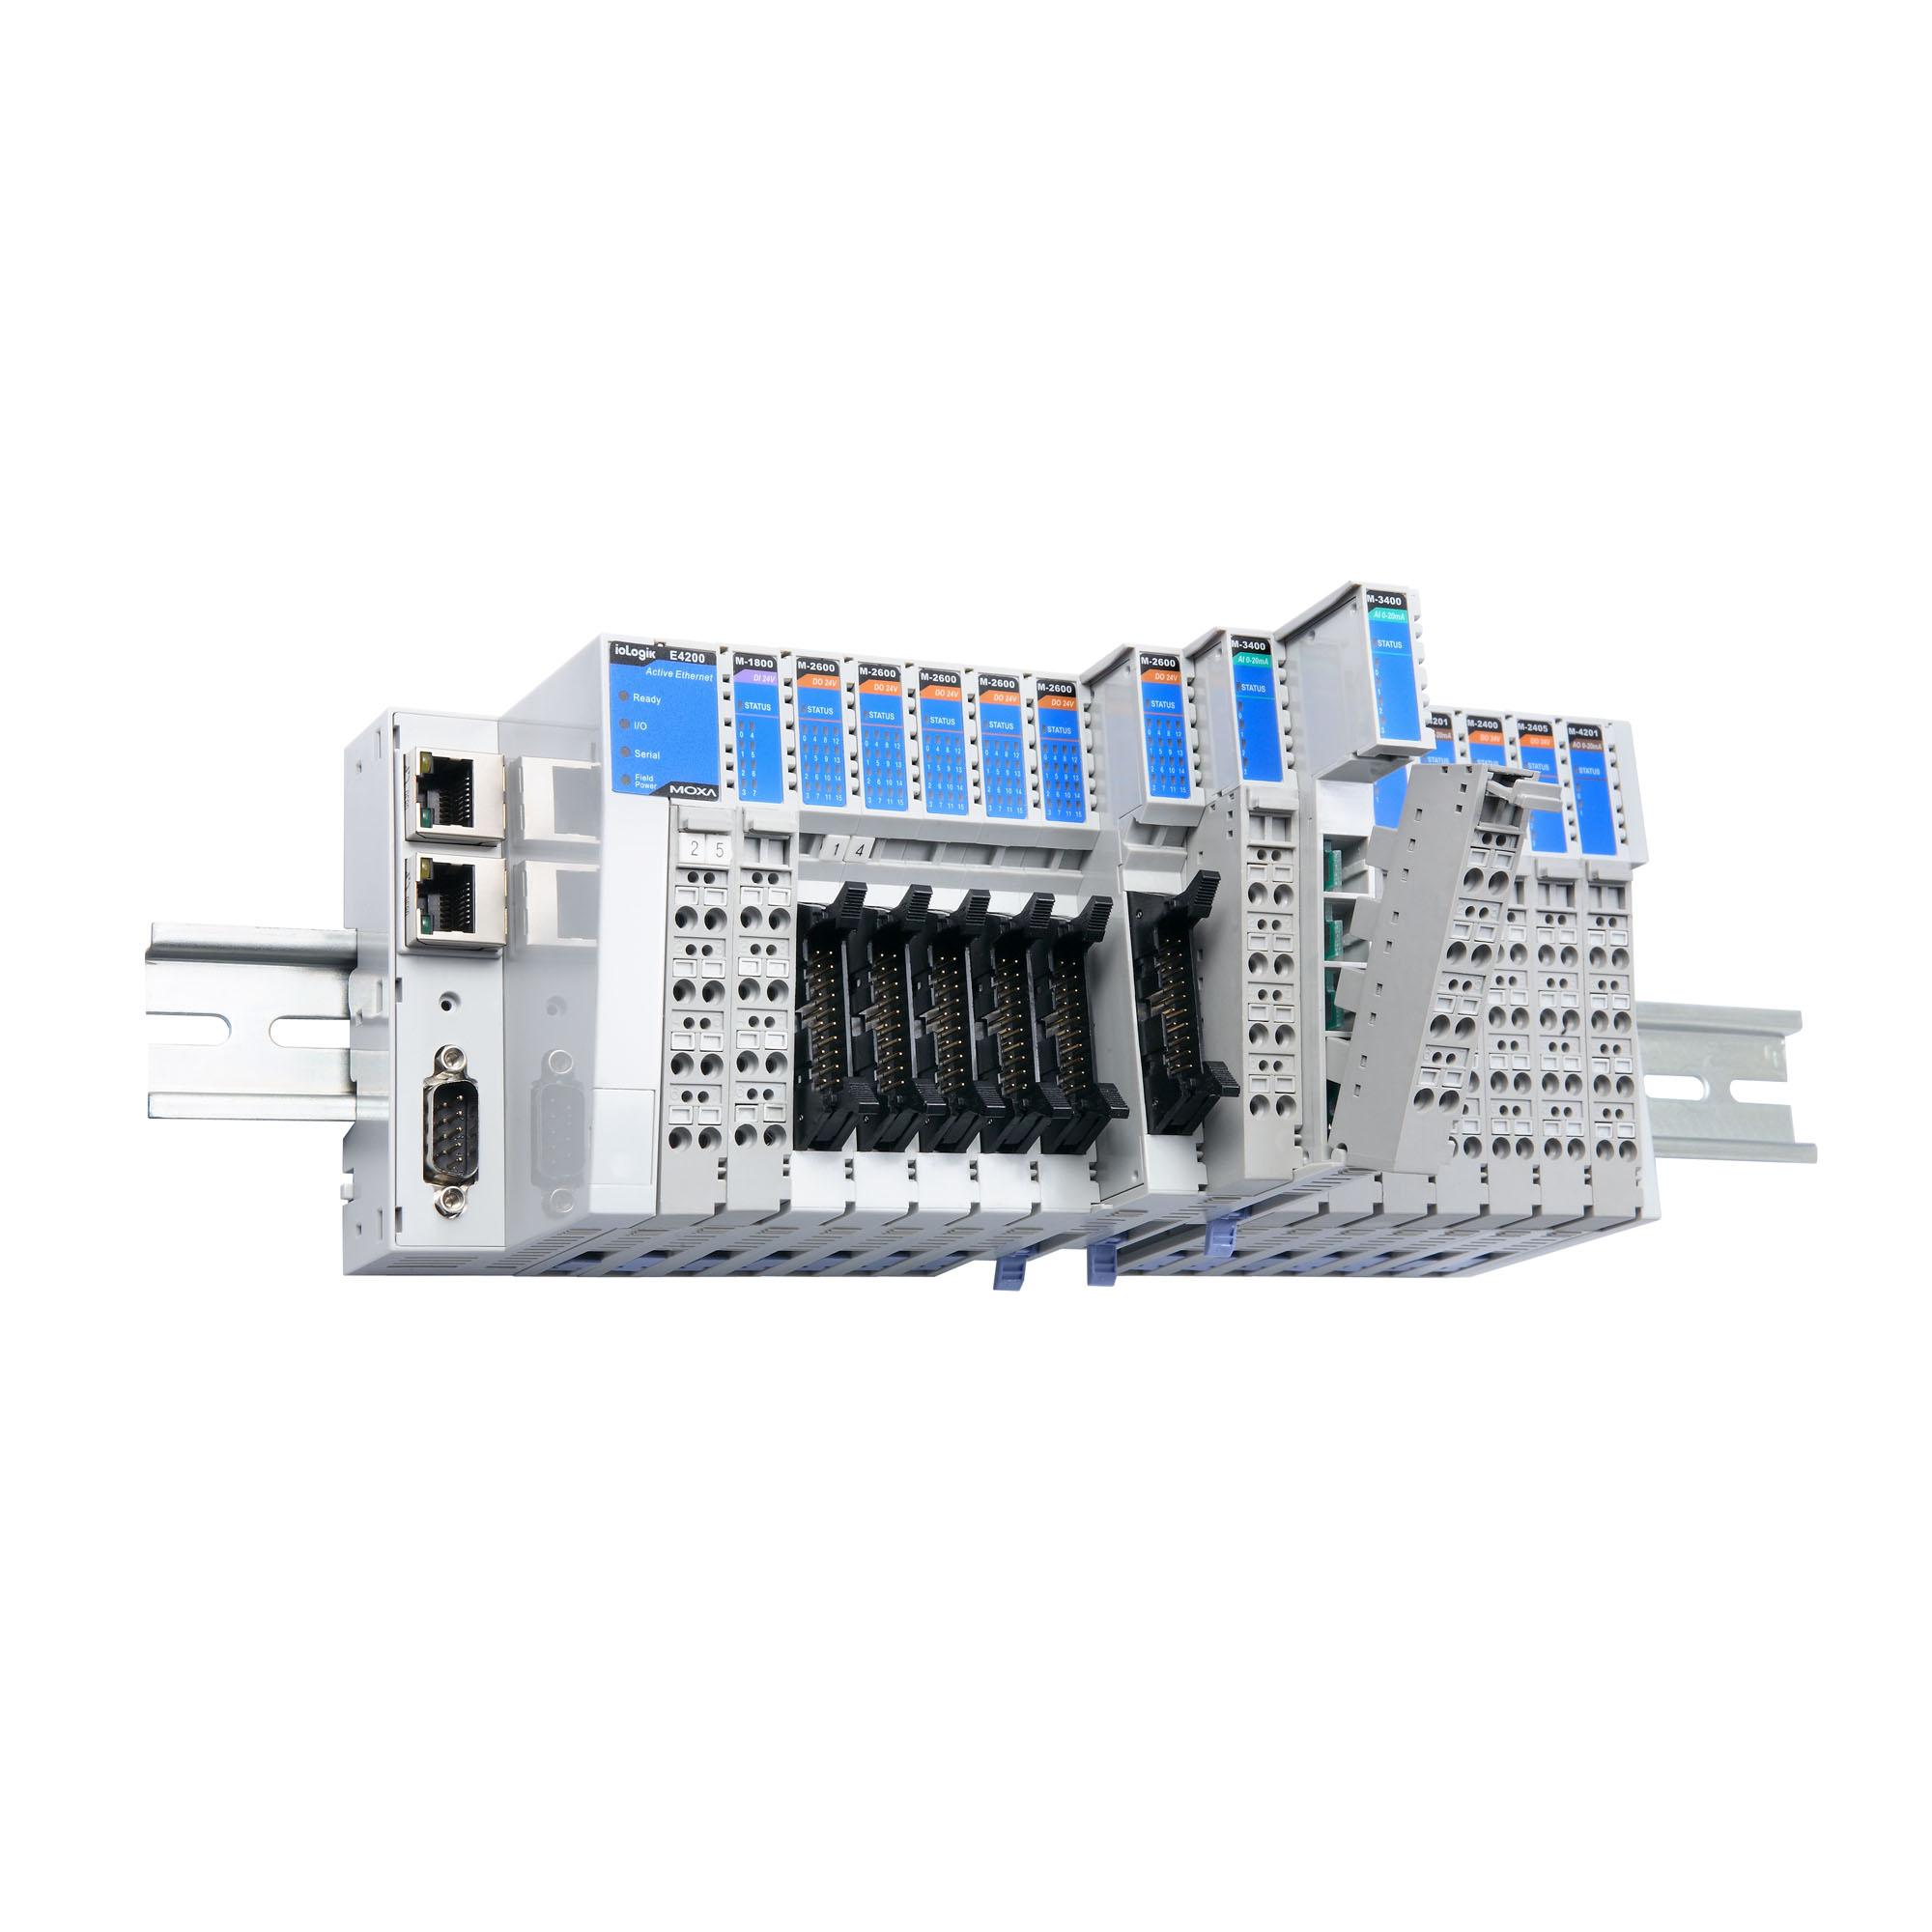 ioLogik 4000 Series - Universal Controllers & I/Os   MOXA